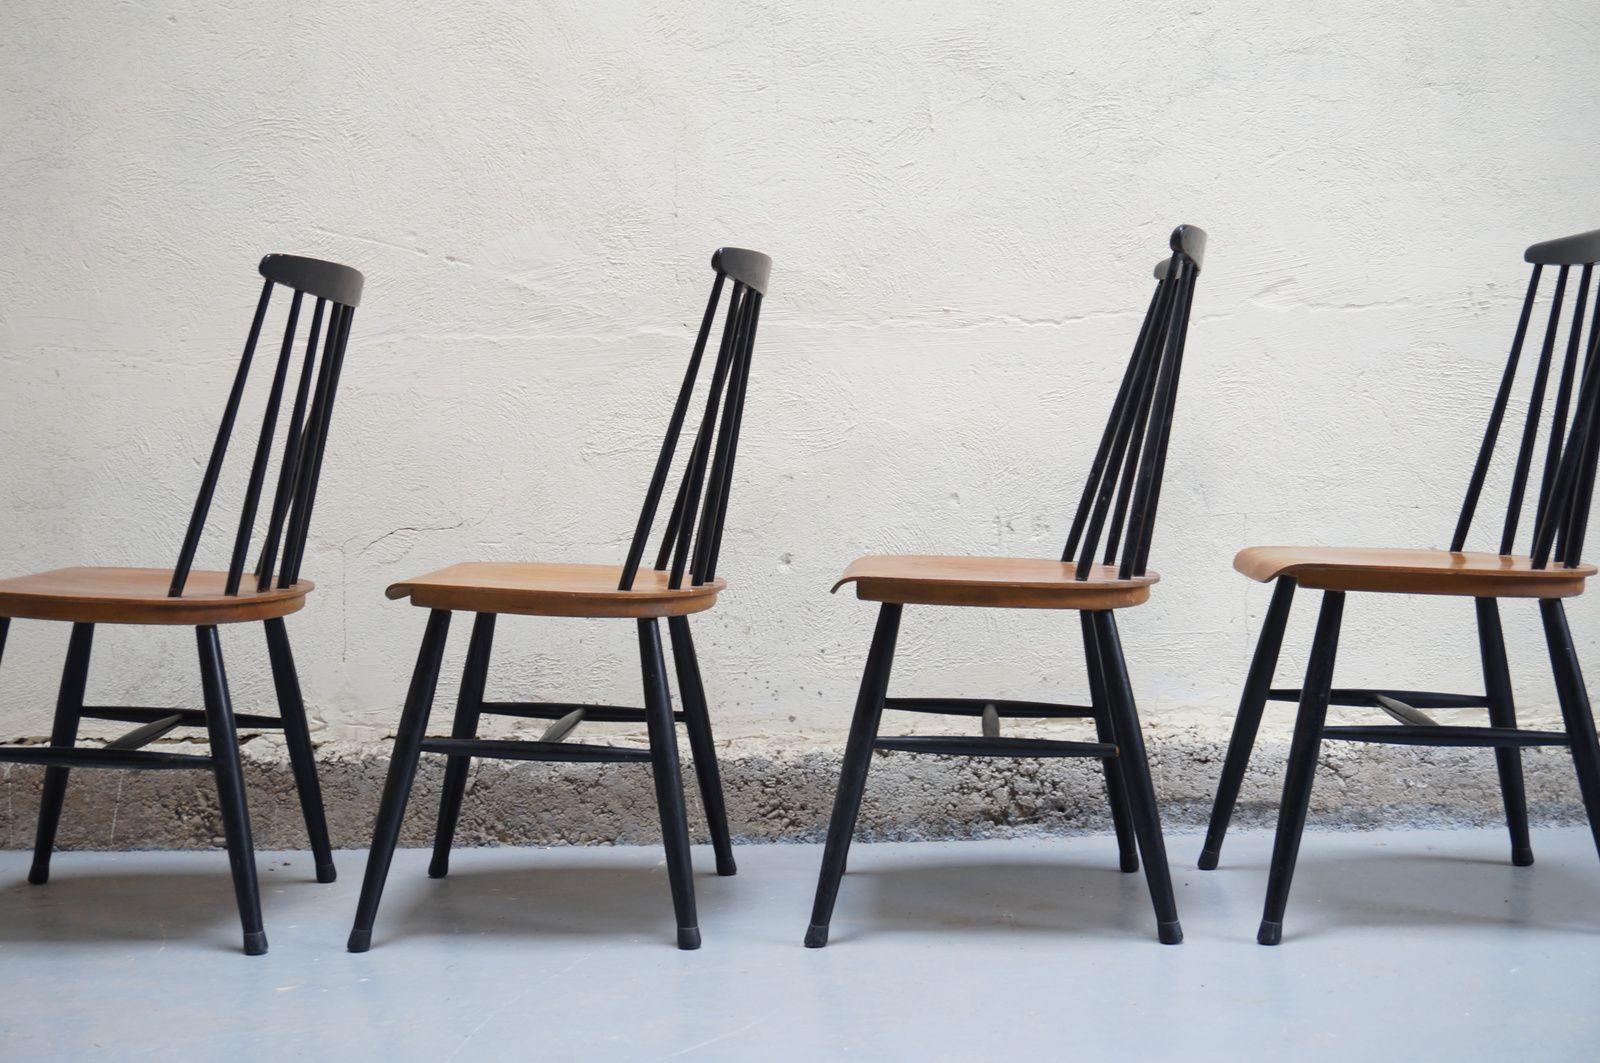 chaises fanett du designer ilmari tapiovaara design su dois ann es 50 60 70 vintage scandinave. Black Bedroom Furniture Sets. Home Design Ideas